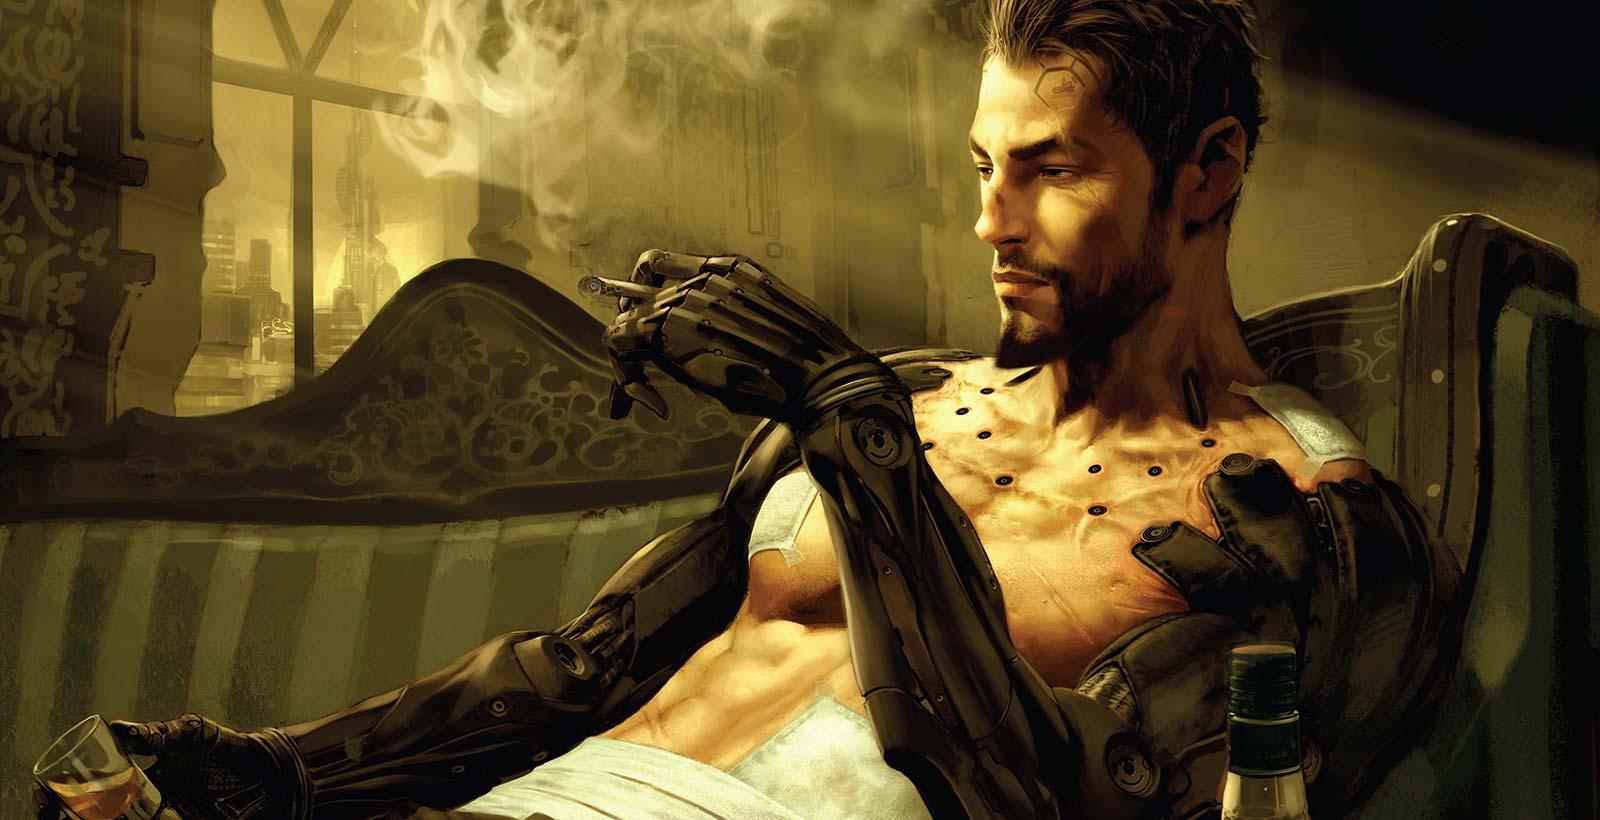 Le jeu Deus Ex: Human Revolution explore l'idéologie transhumanisme